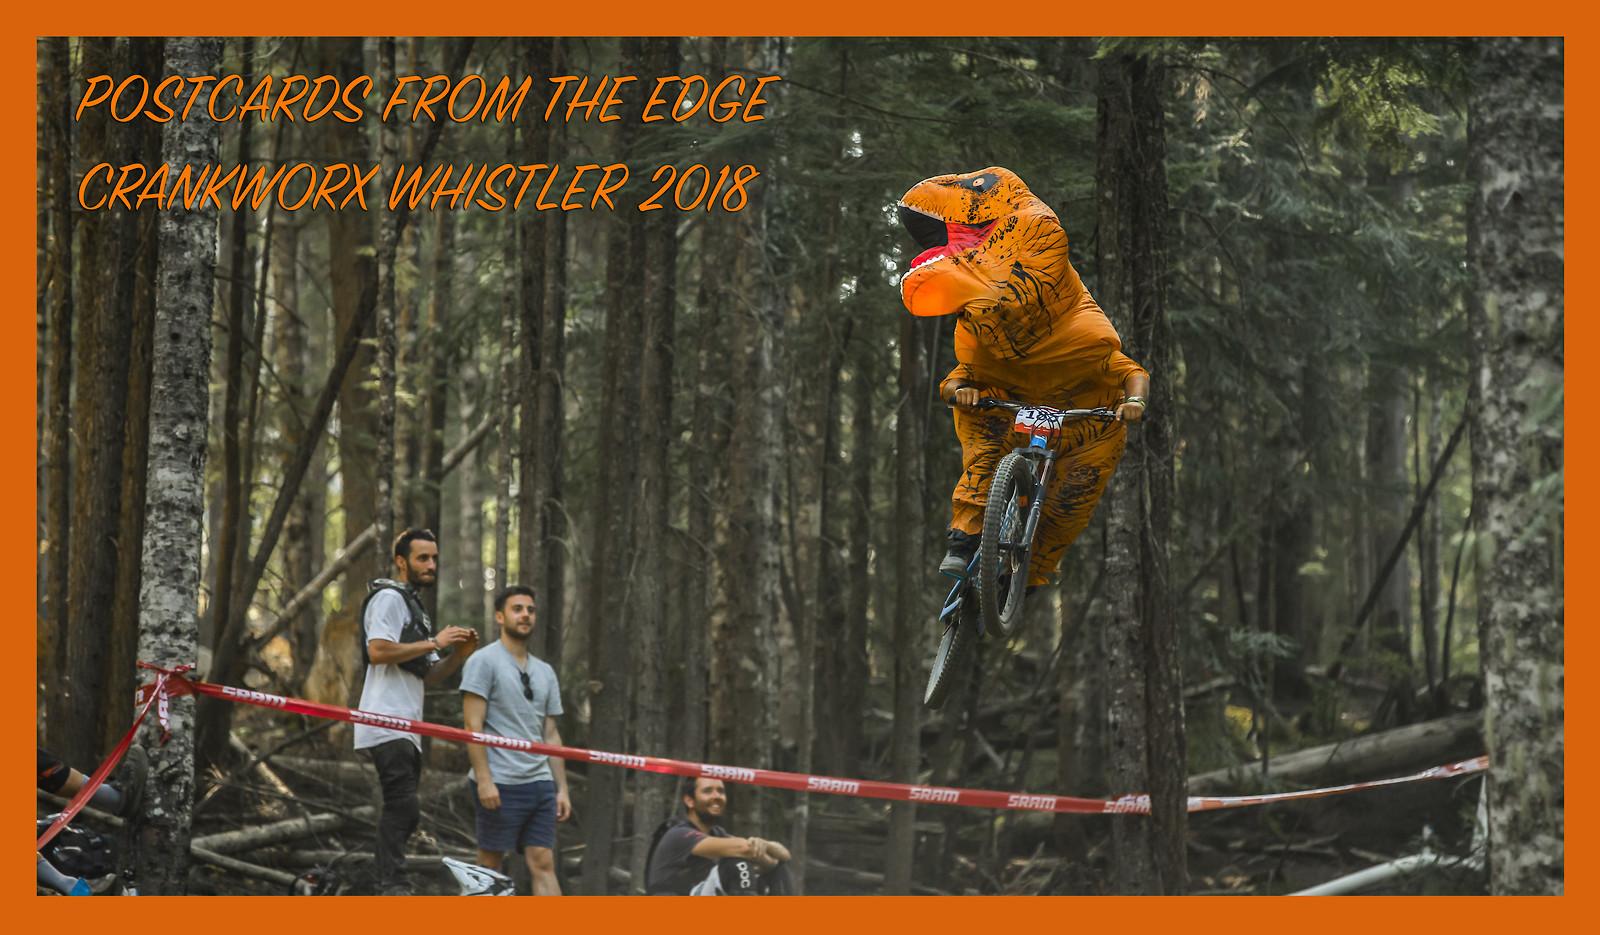 31859698647 cd20c76814 o - phunkt.com - Mountain Biking Pictures - Vital MTB